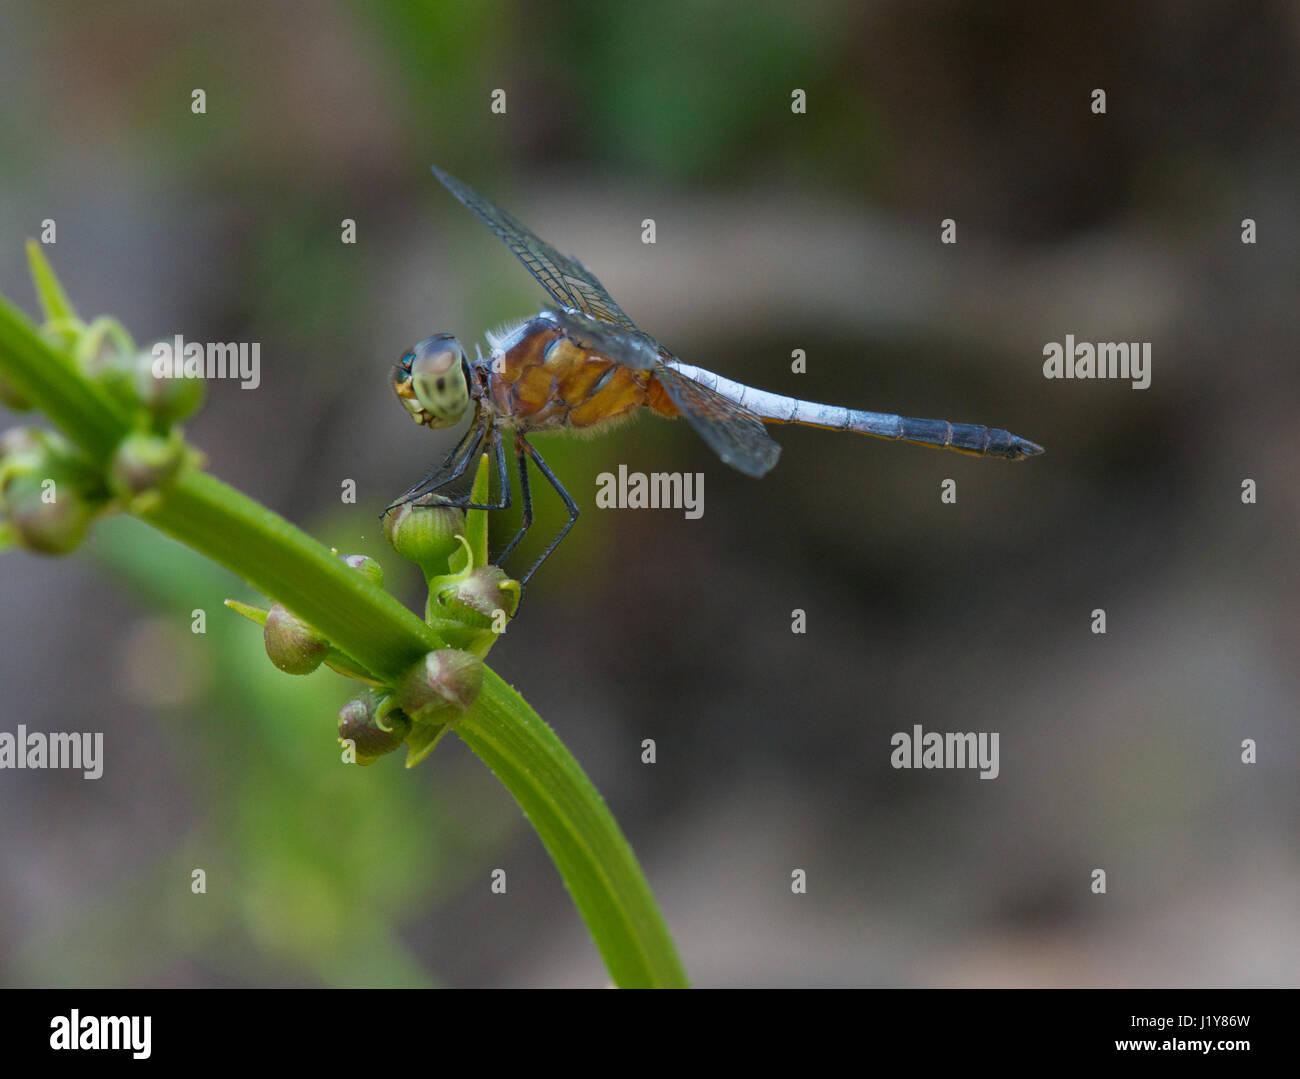 Dragonfly in Vietnam Immagini Stock